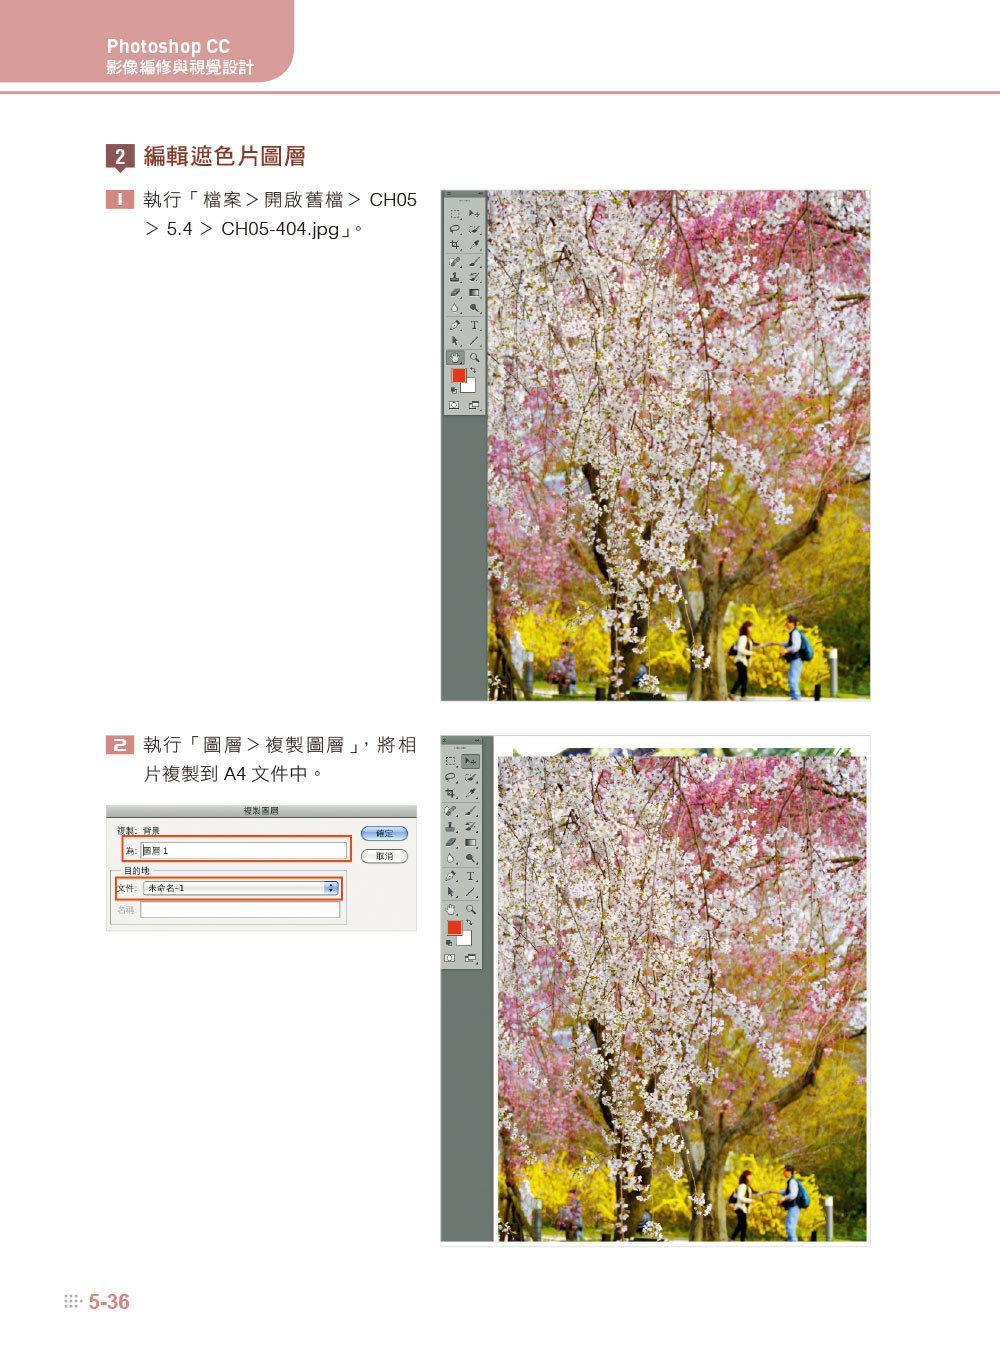 Photoshop CC 影像編修與視覺設計 (含ACA-Photoshop CC國際認證完全模擬與解題)-preview-5